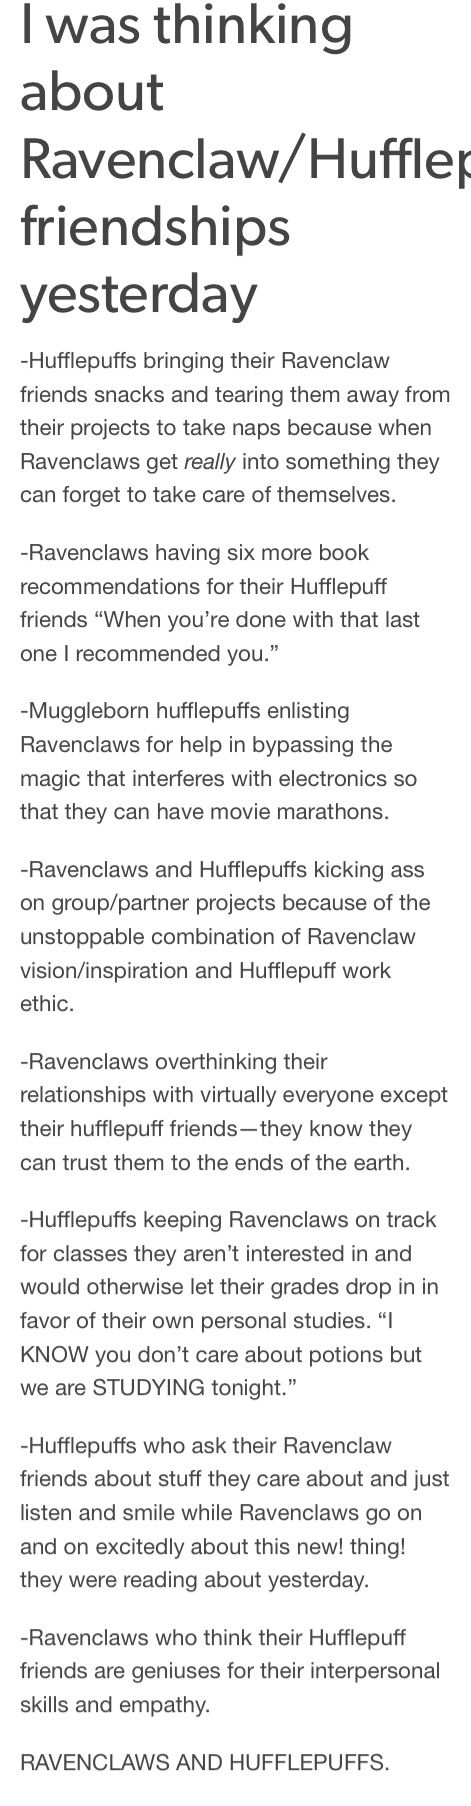 hufflepuff dating website